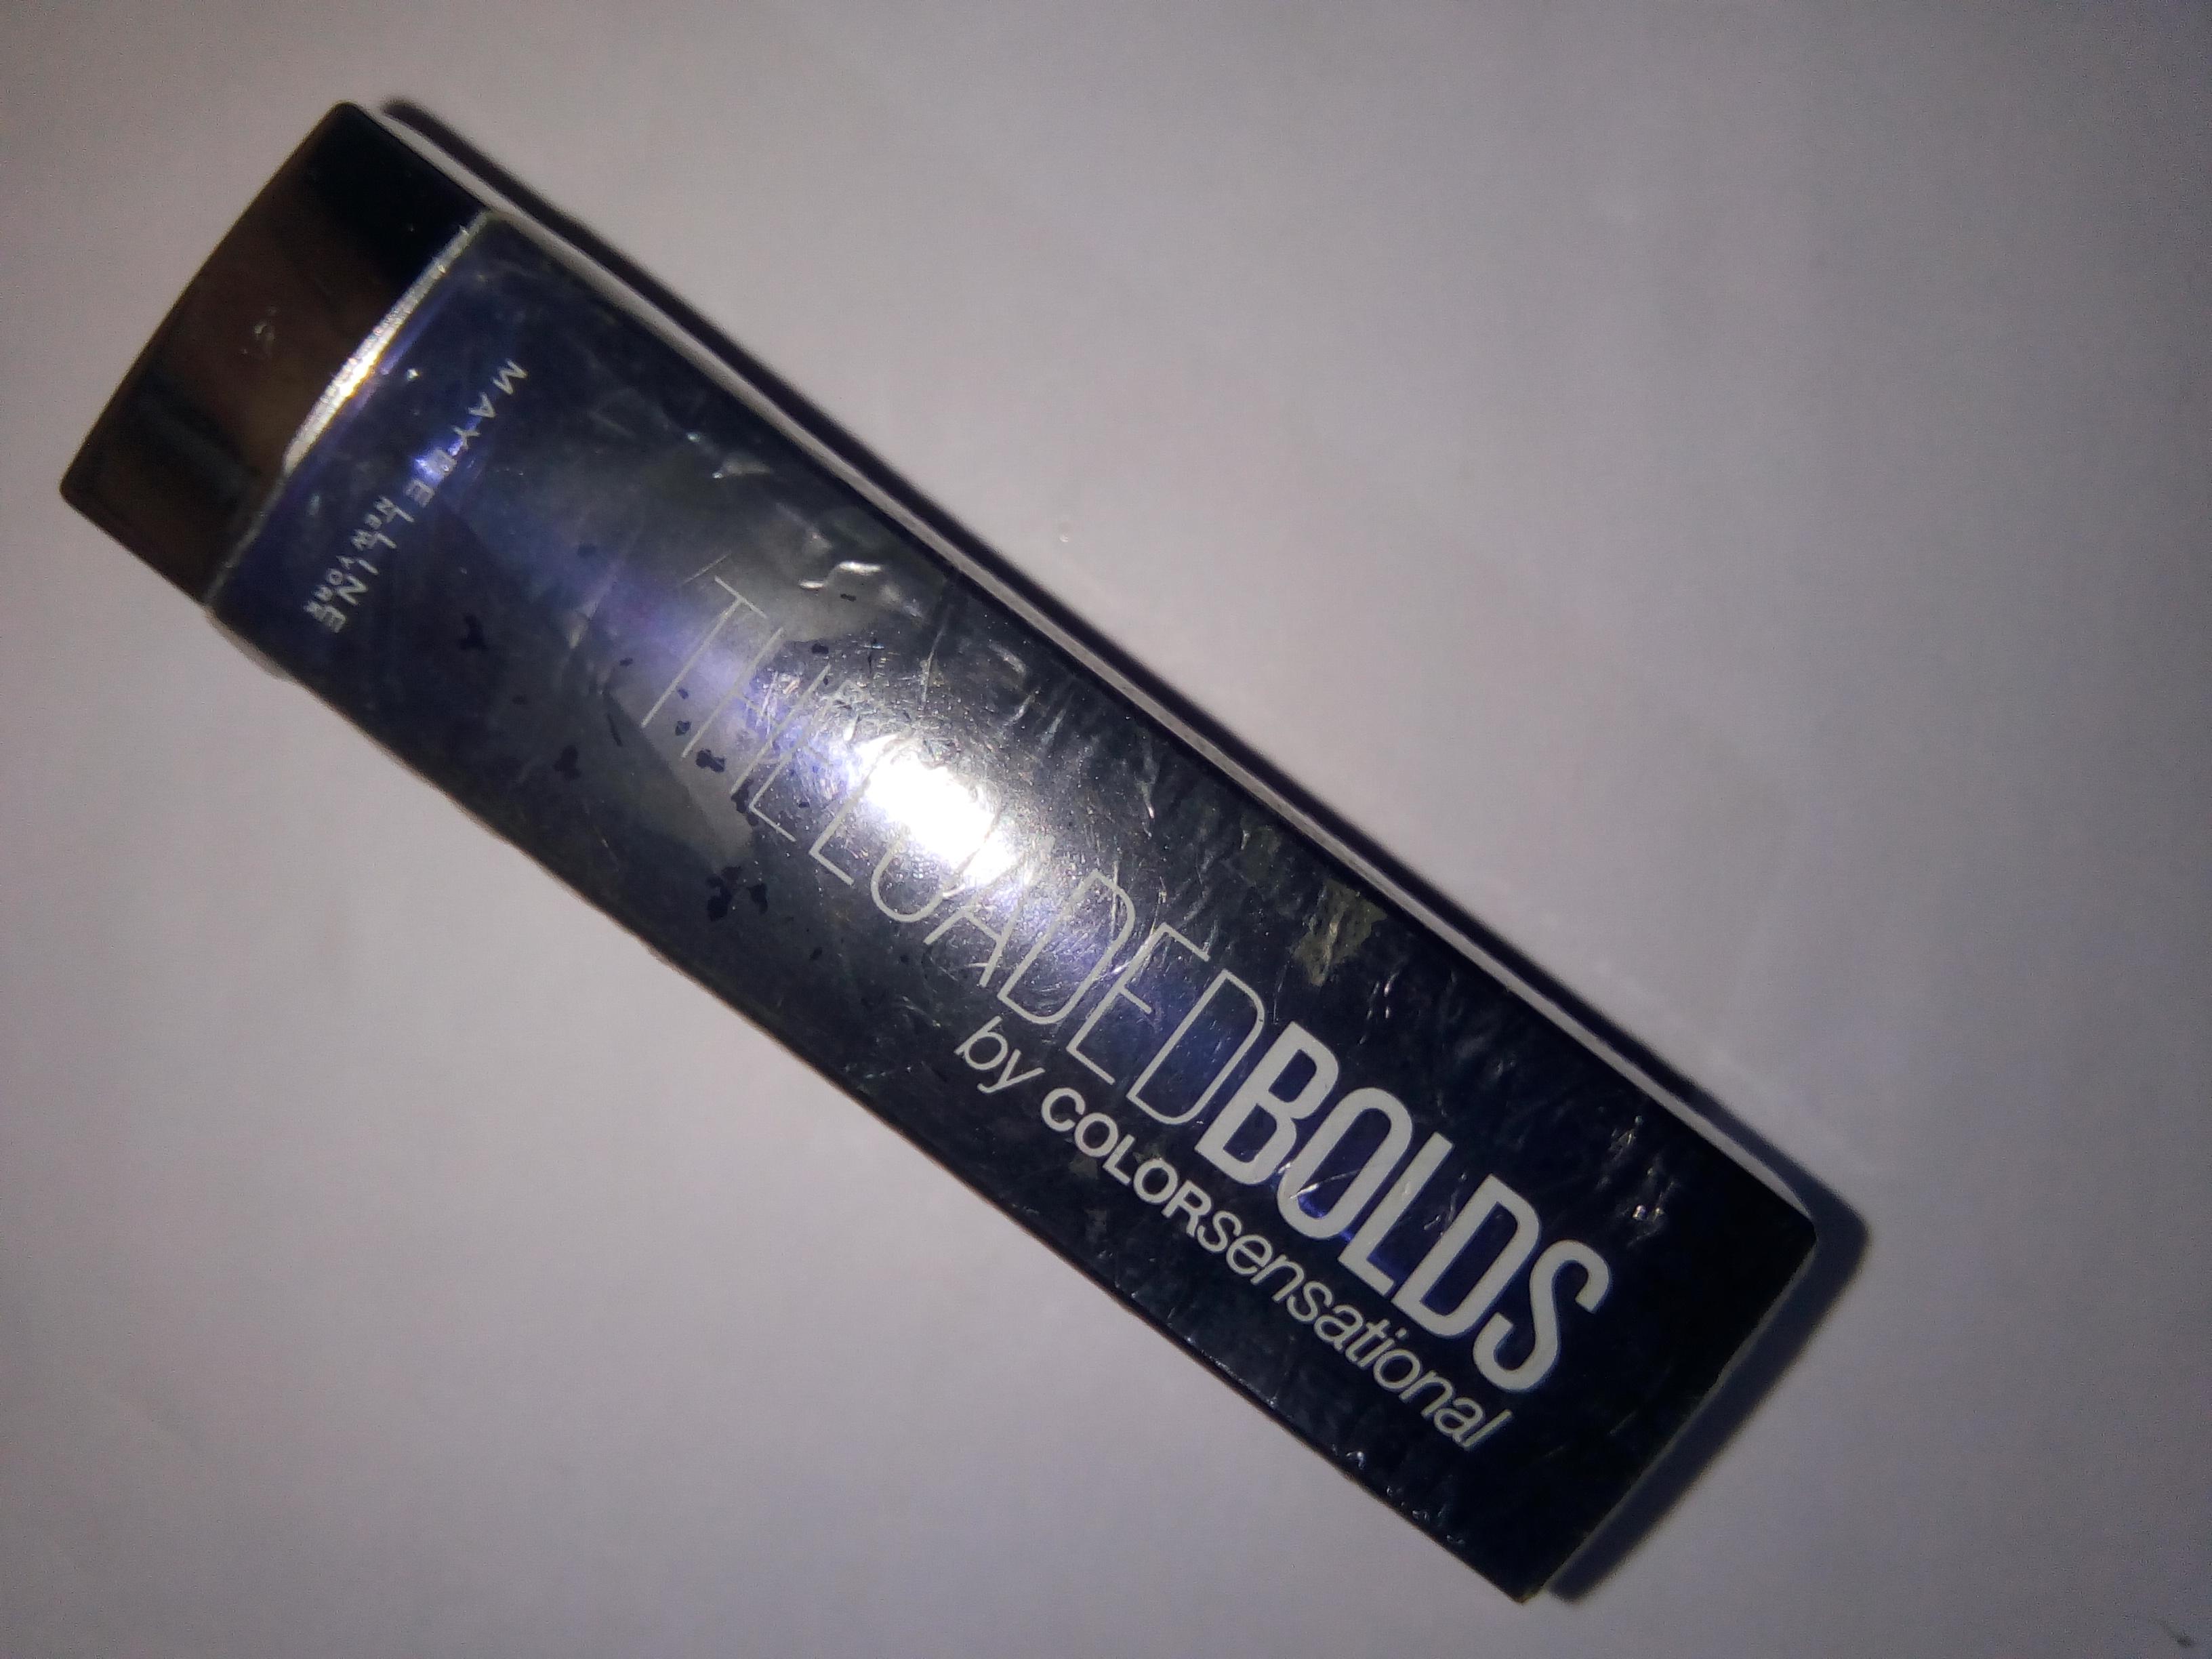 Maybelline Loaded Bolds Lipstick -Maybelline Loaded Bolds Lipstick-By aneesha